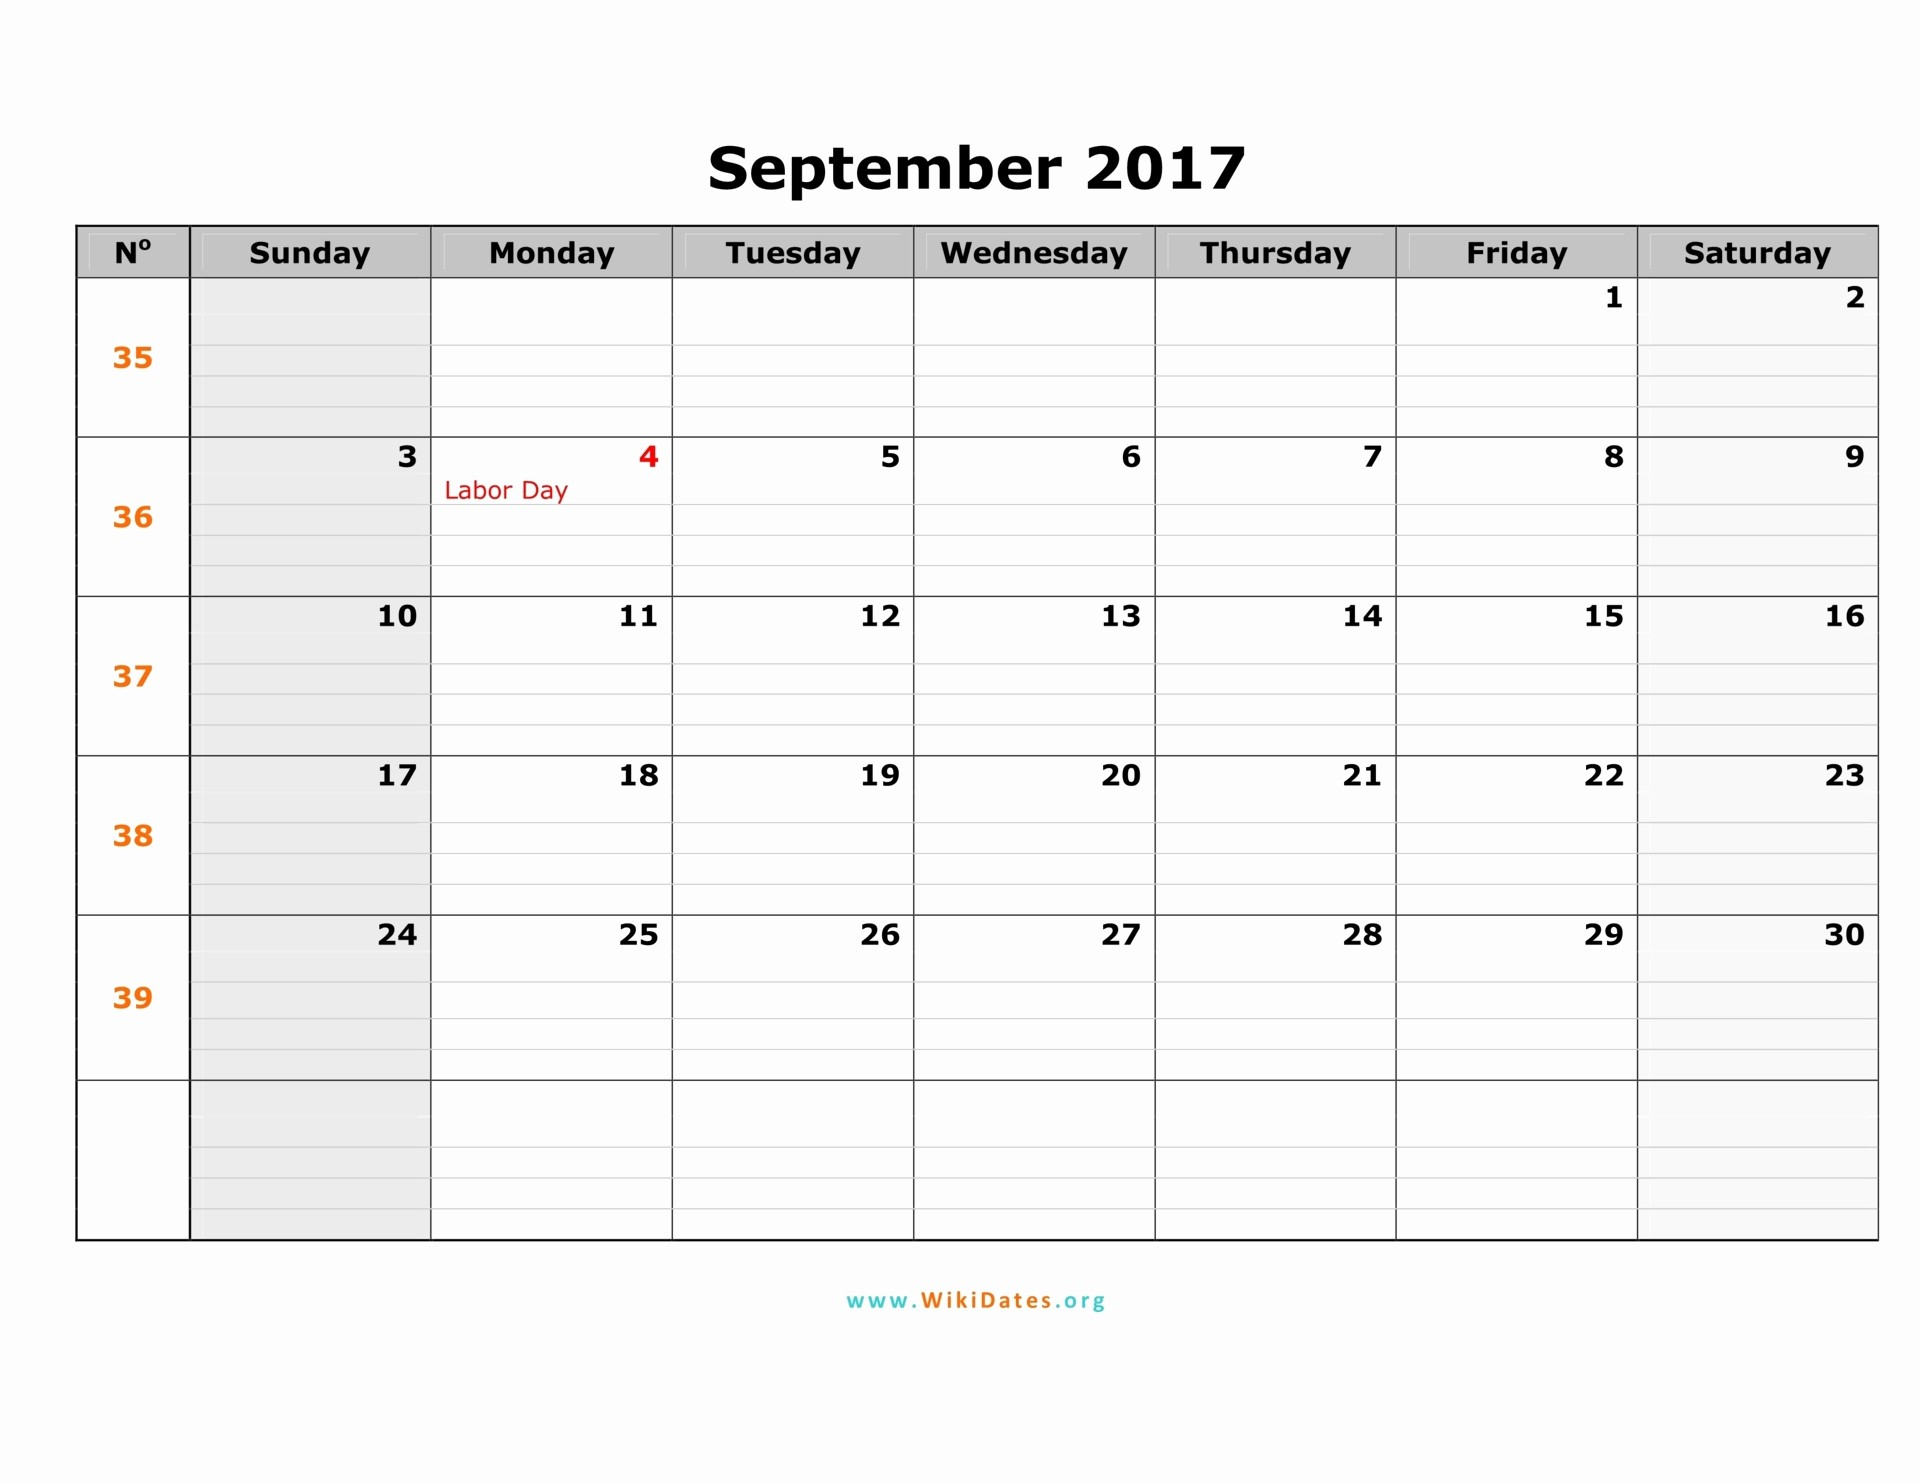 Calendar 2017 Template with Holidays Elegant September 2017 Calendar with Holidays Uk